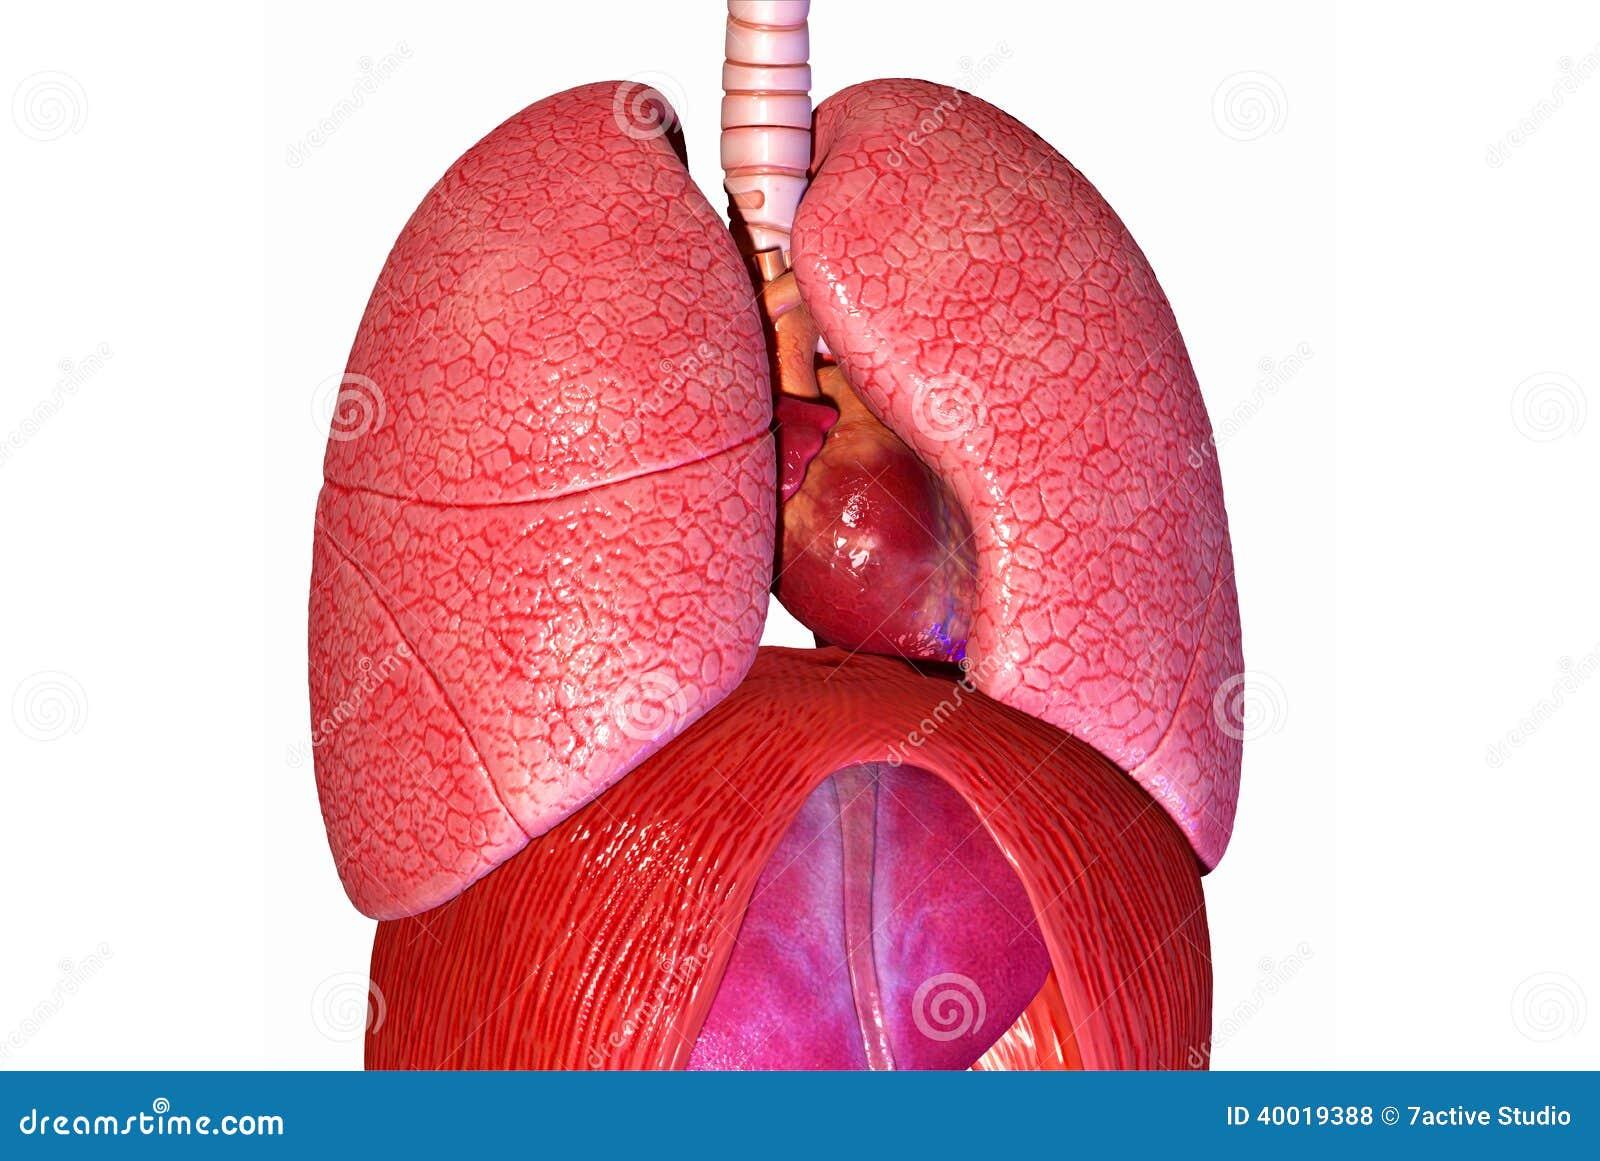 肺����y�9����_人的肺